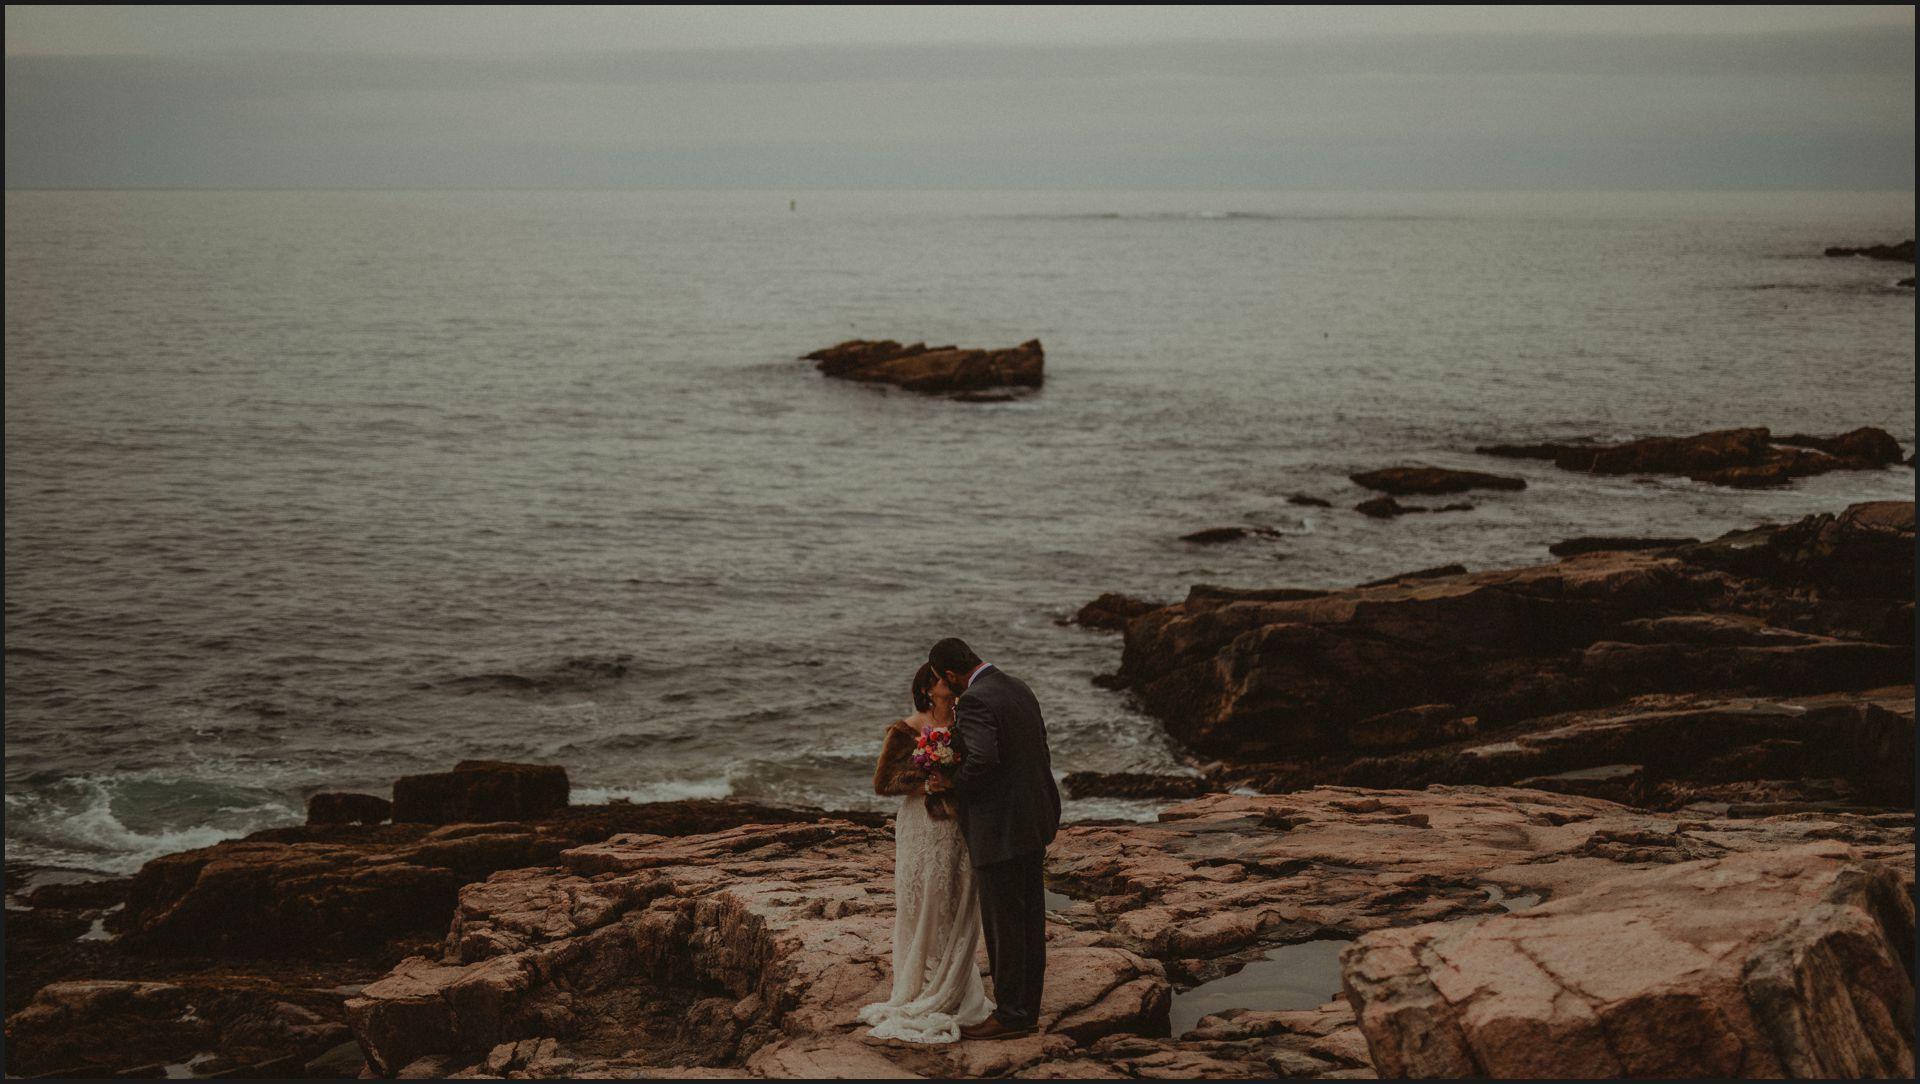 acadia national park, maine, wedding, couple portrait, bride, groom, destination wedding